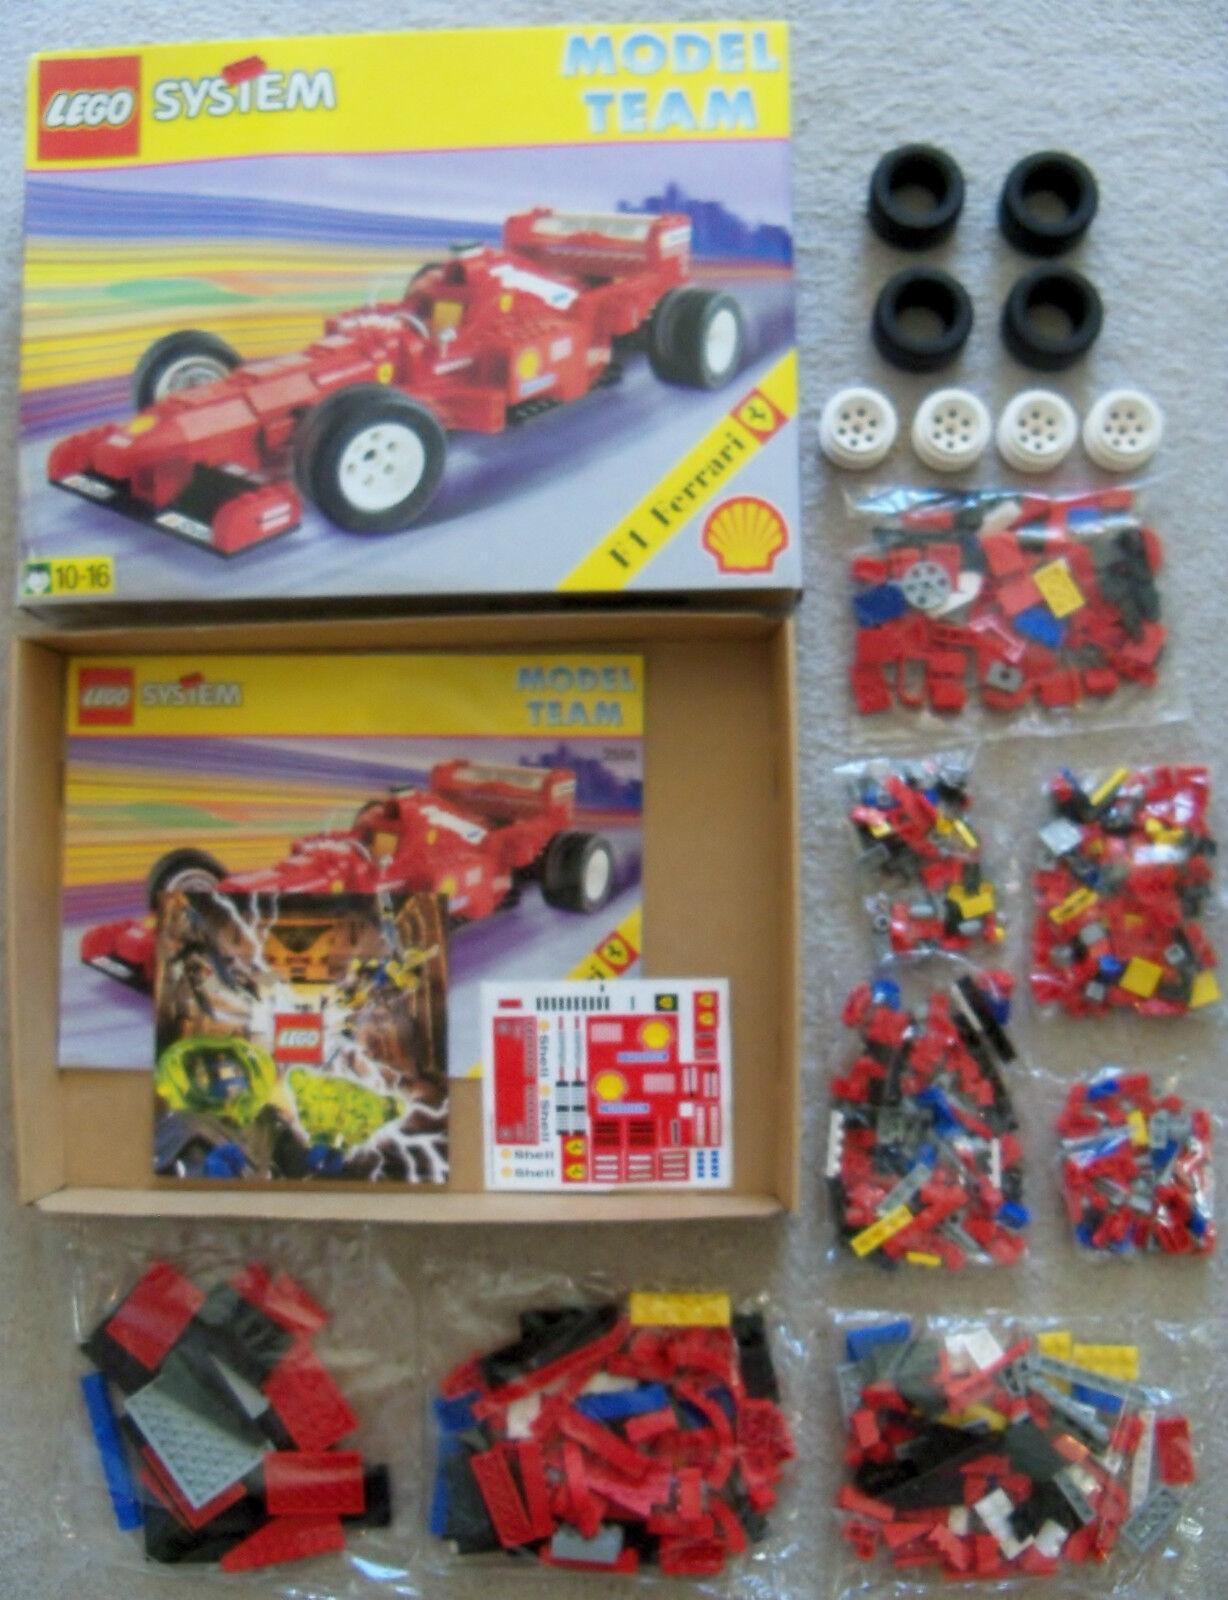 Lego System Racing - Selten Modell Team F1 Ferrari 2556 - Neu (Open Box)